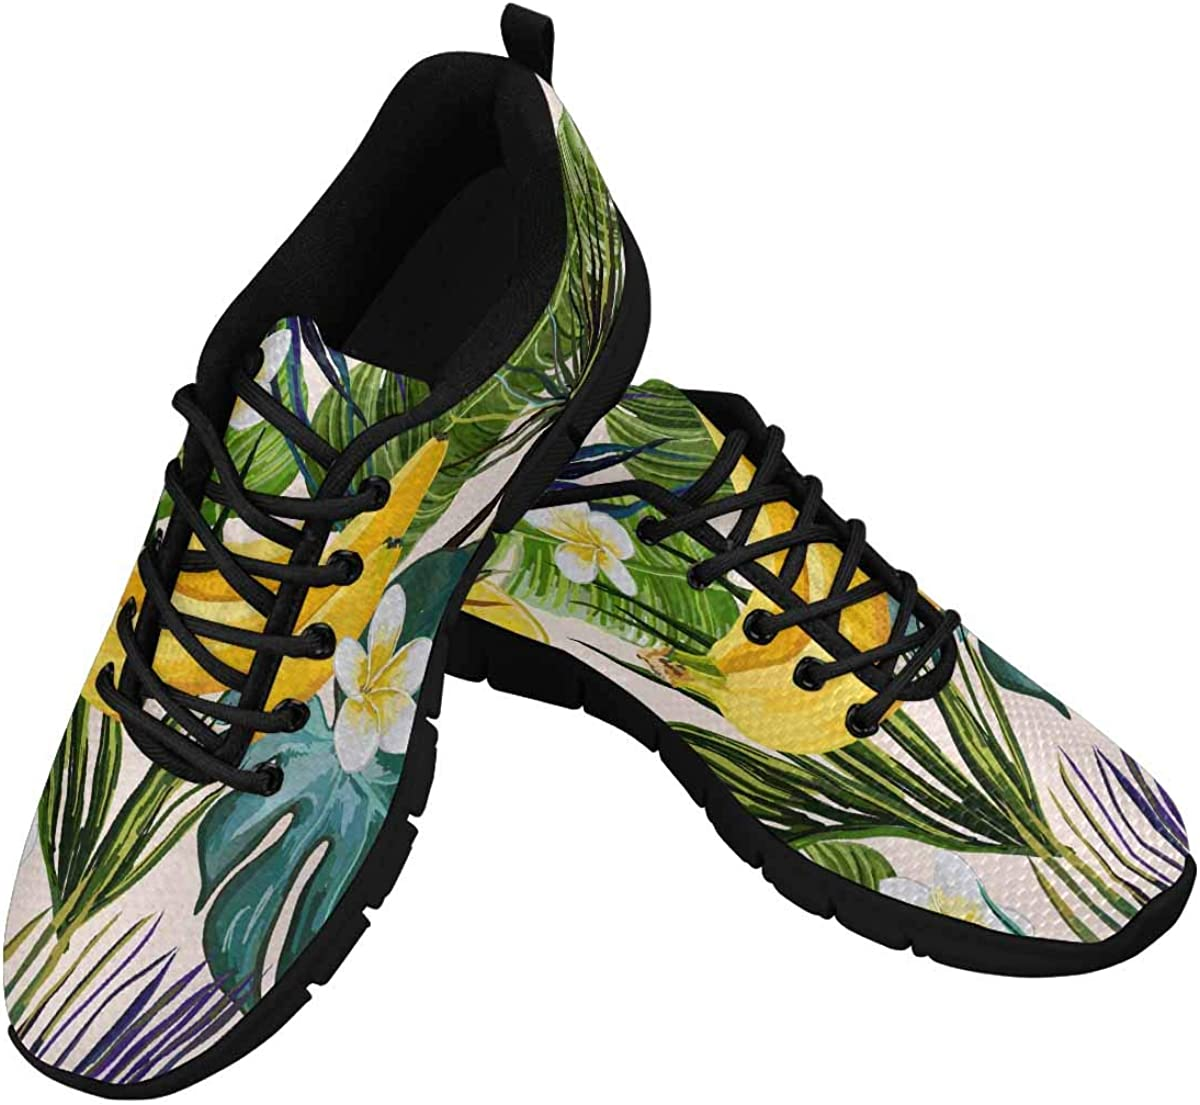 InterestPrint Tropical Palm Leaves Flowers Banana Lemon Women's Lightweight Athletic Casual Gym Sneakers